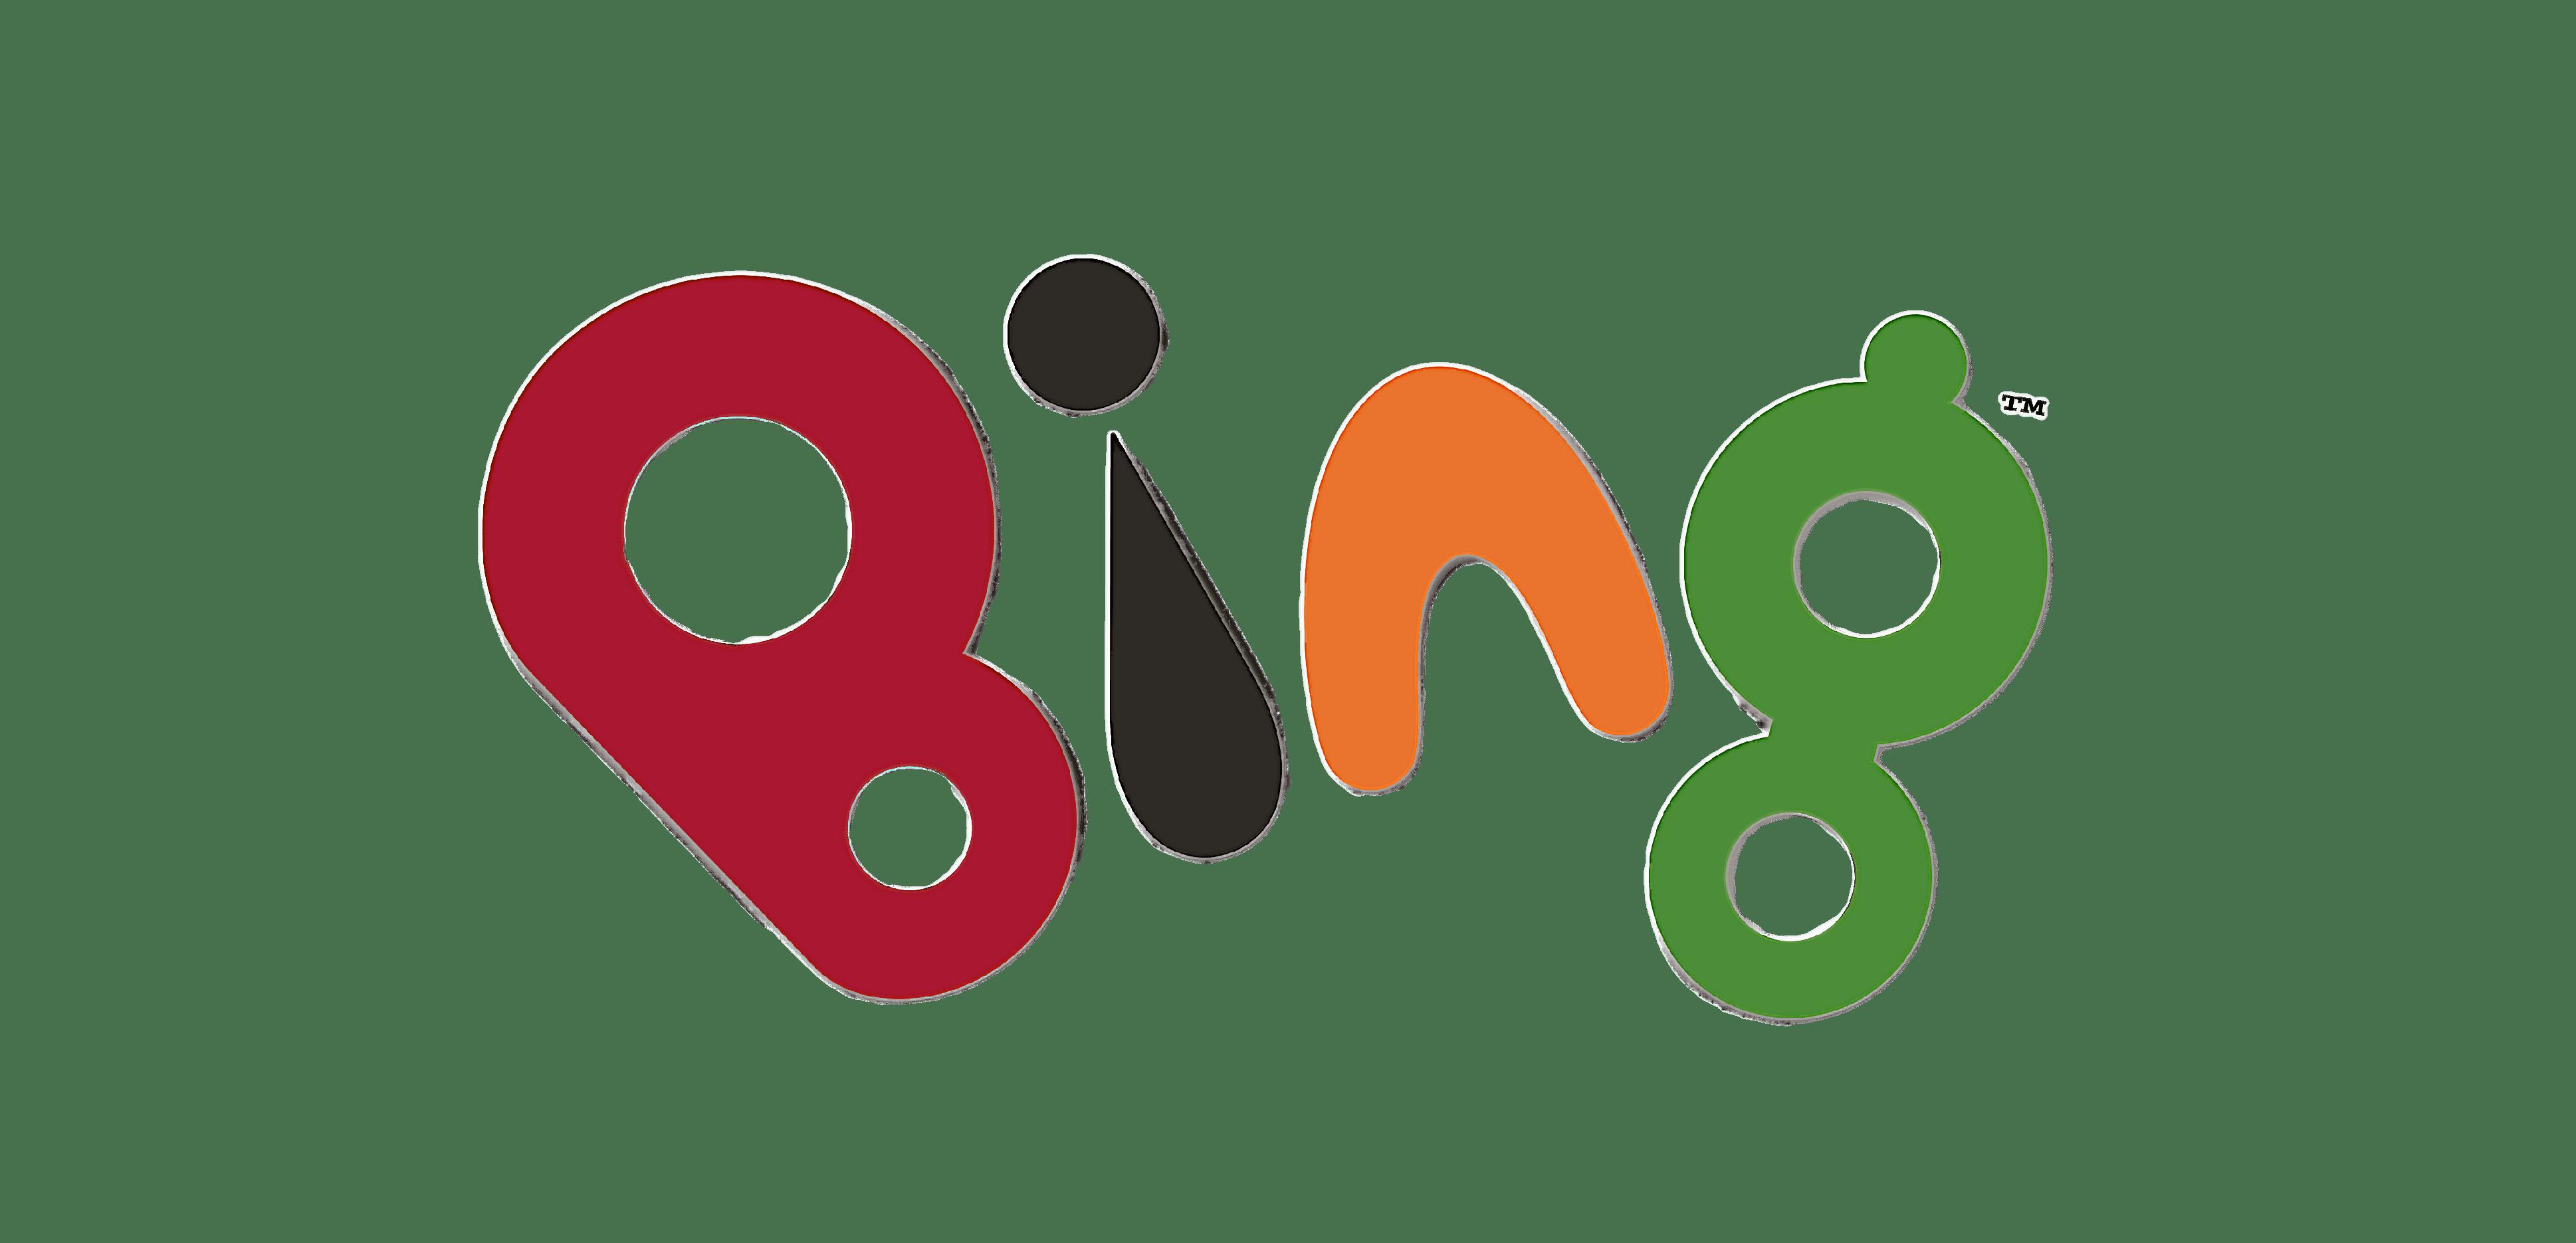 Bing Bunny Simple Logo transparent PNG.